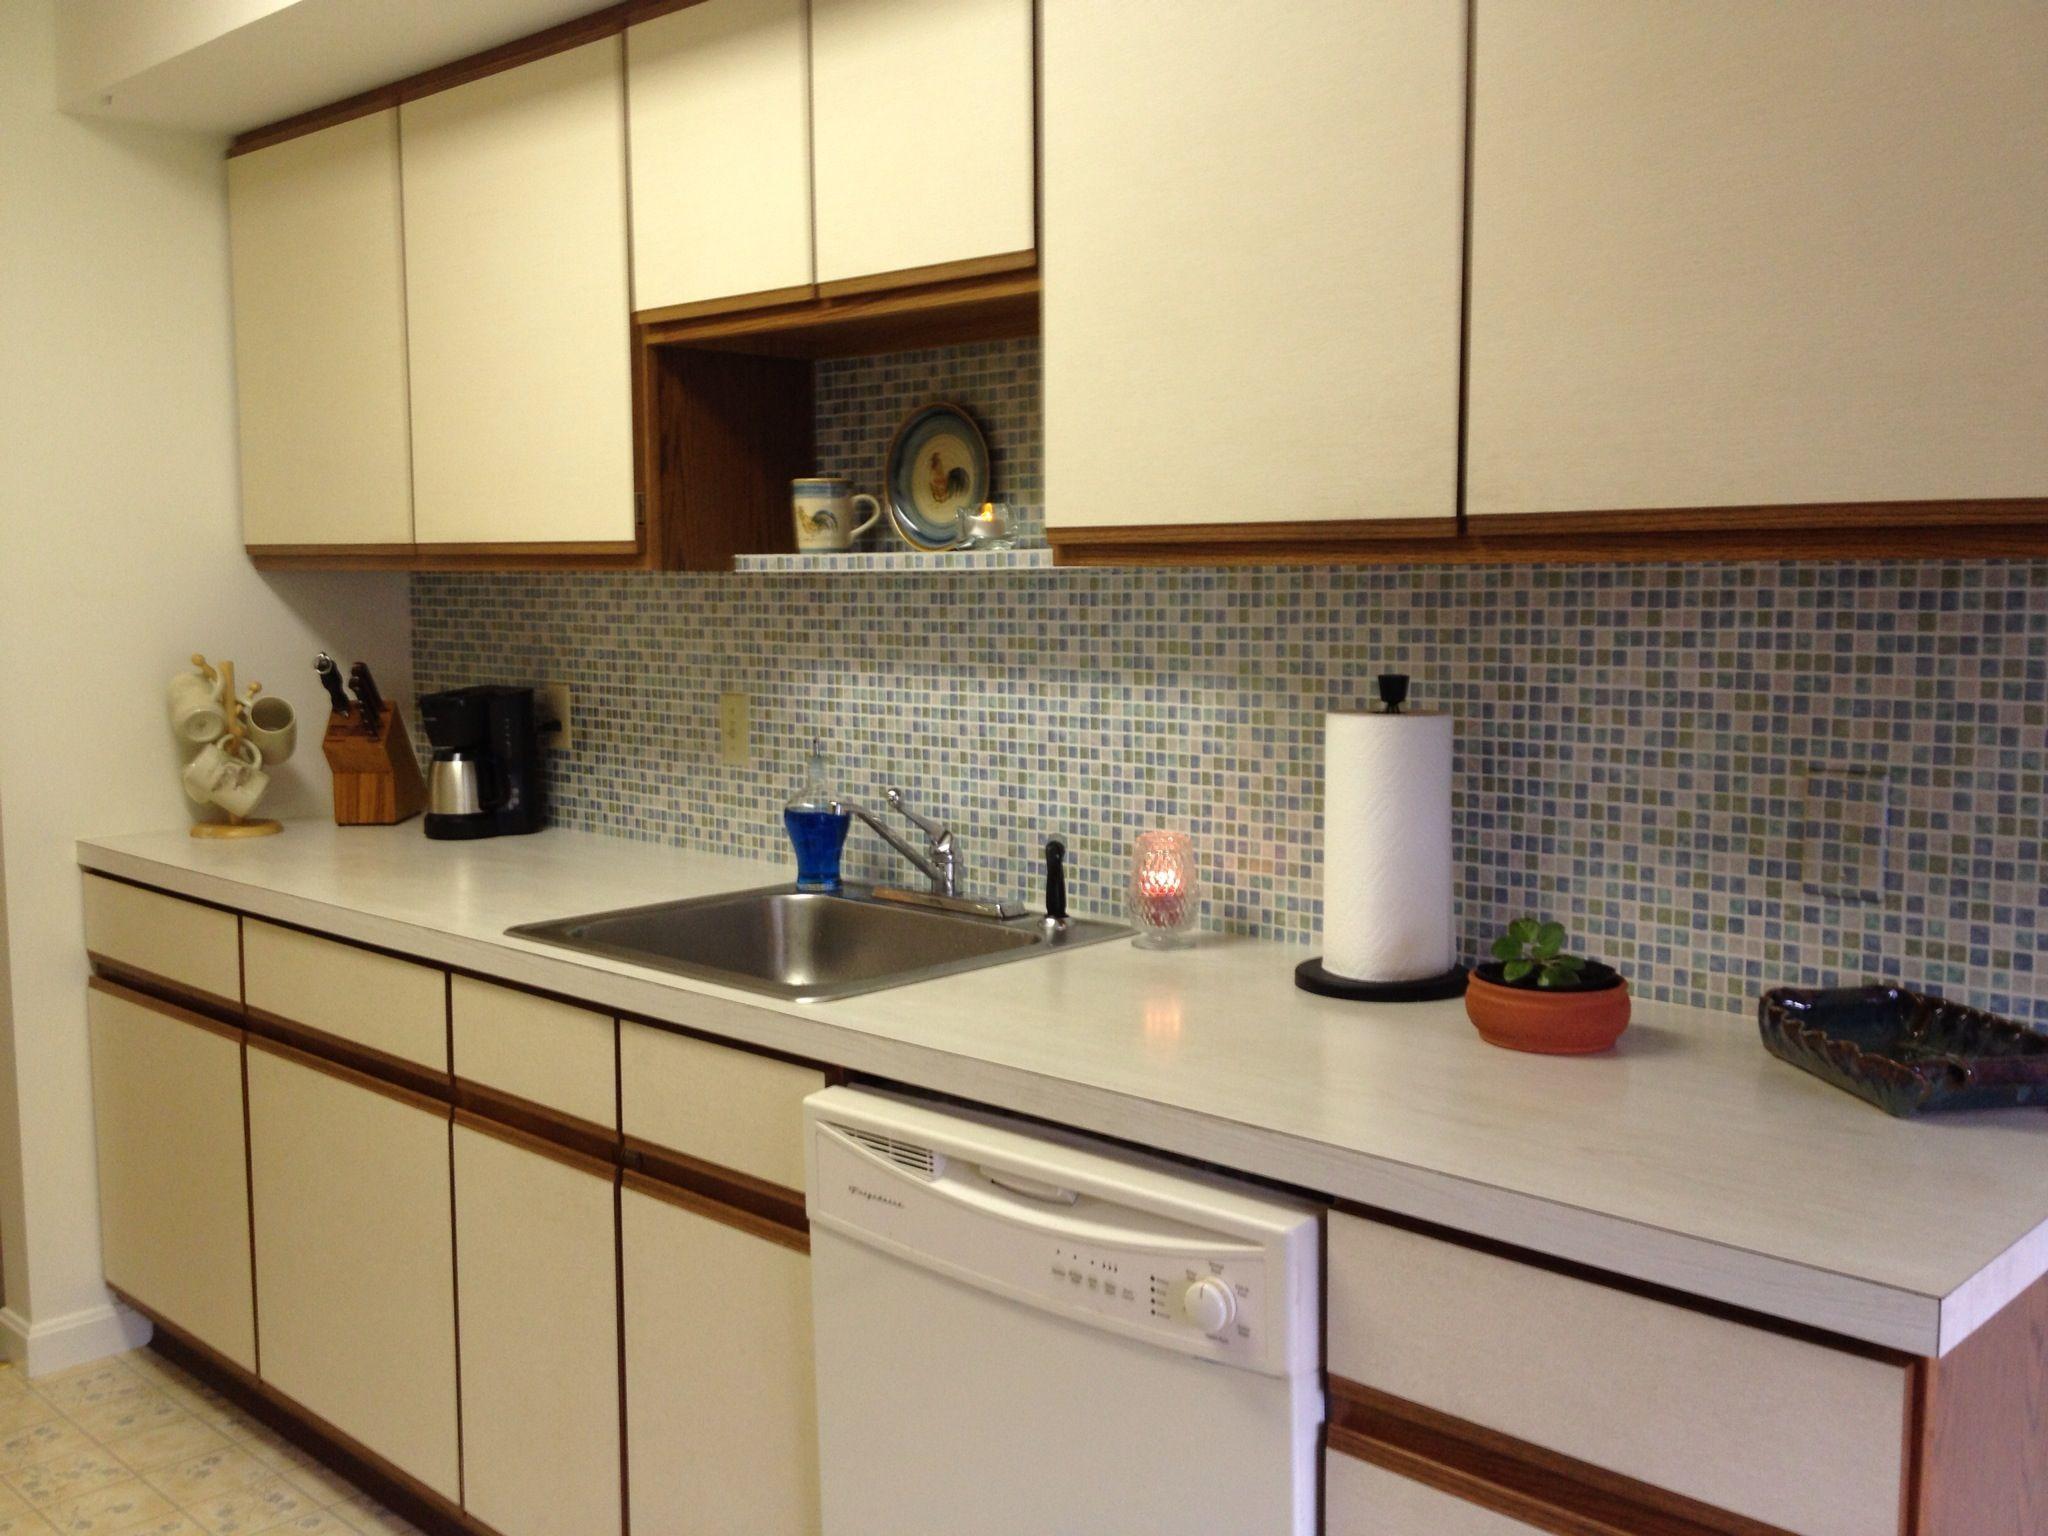 wallpaper kitchen backsplash latest designs faux tile pinterest